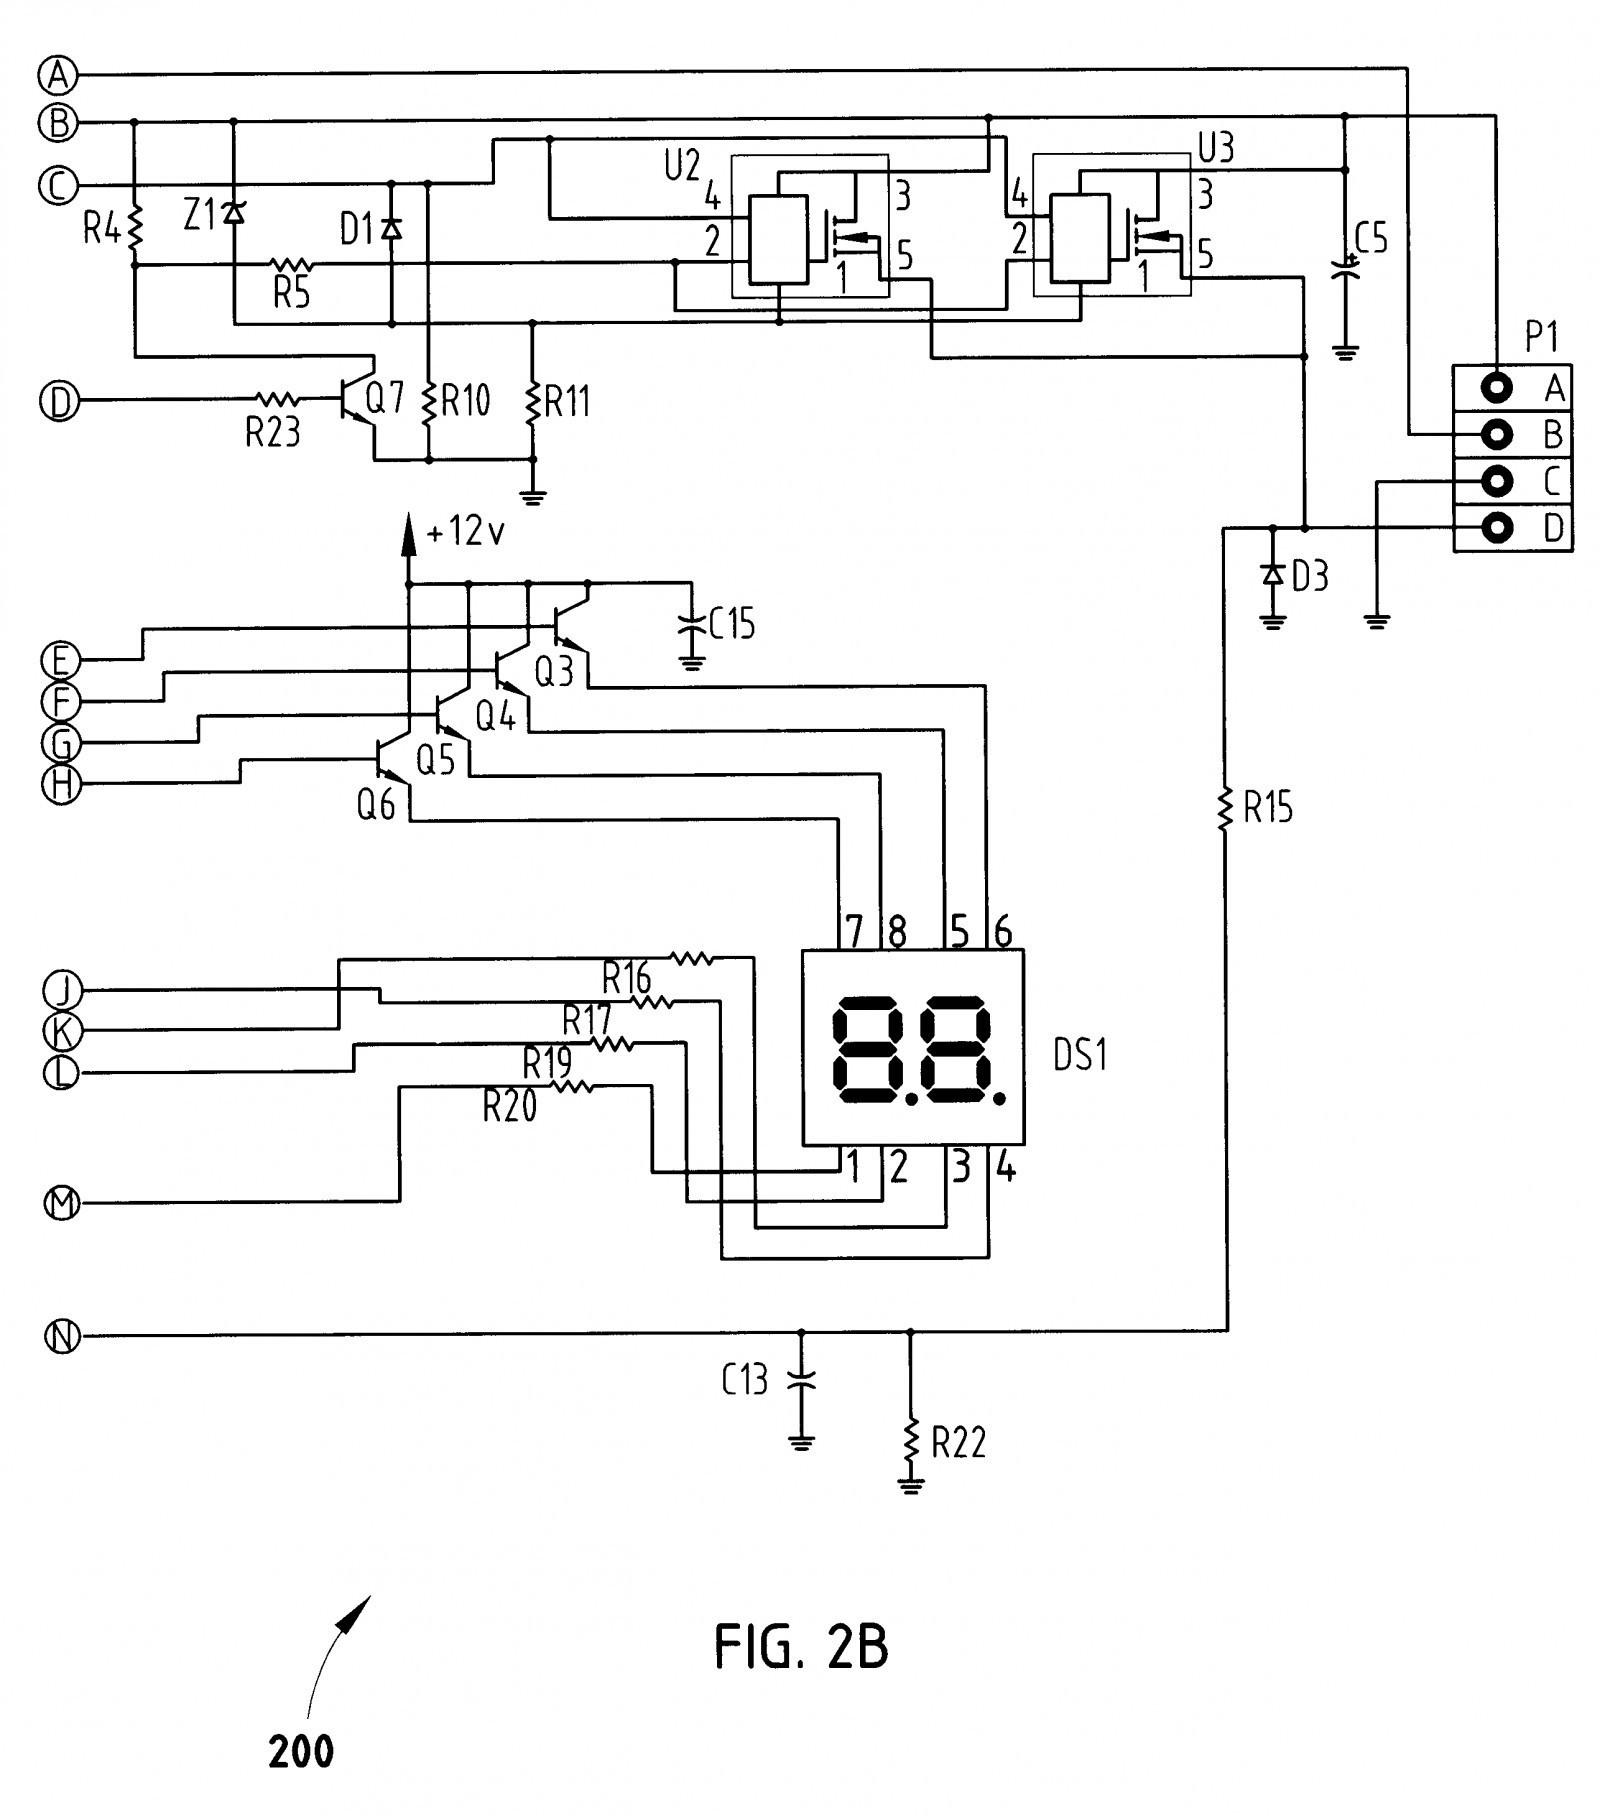 wiring diagram for caravan electric brakes